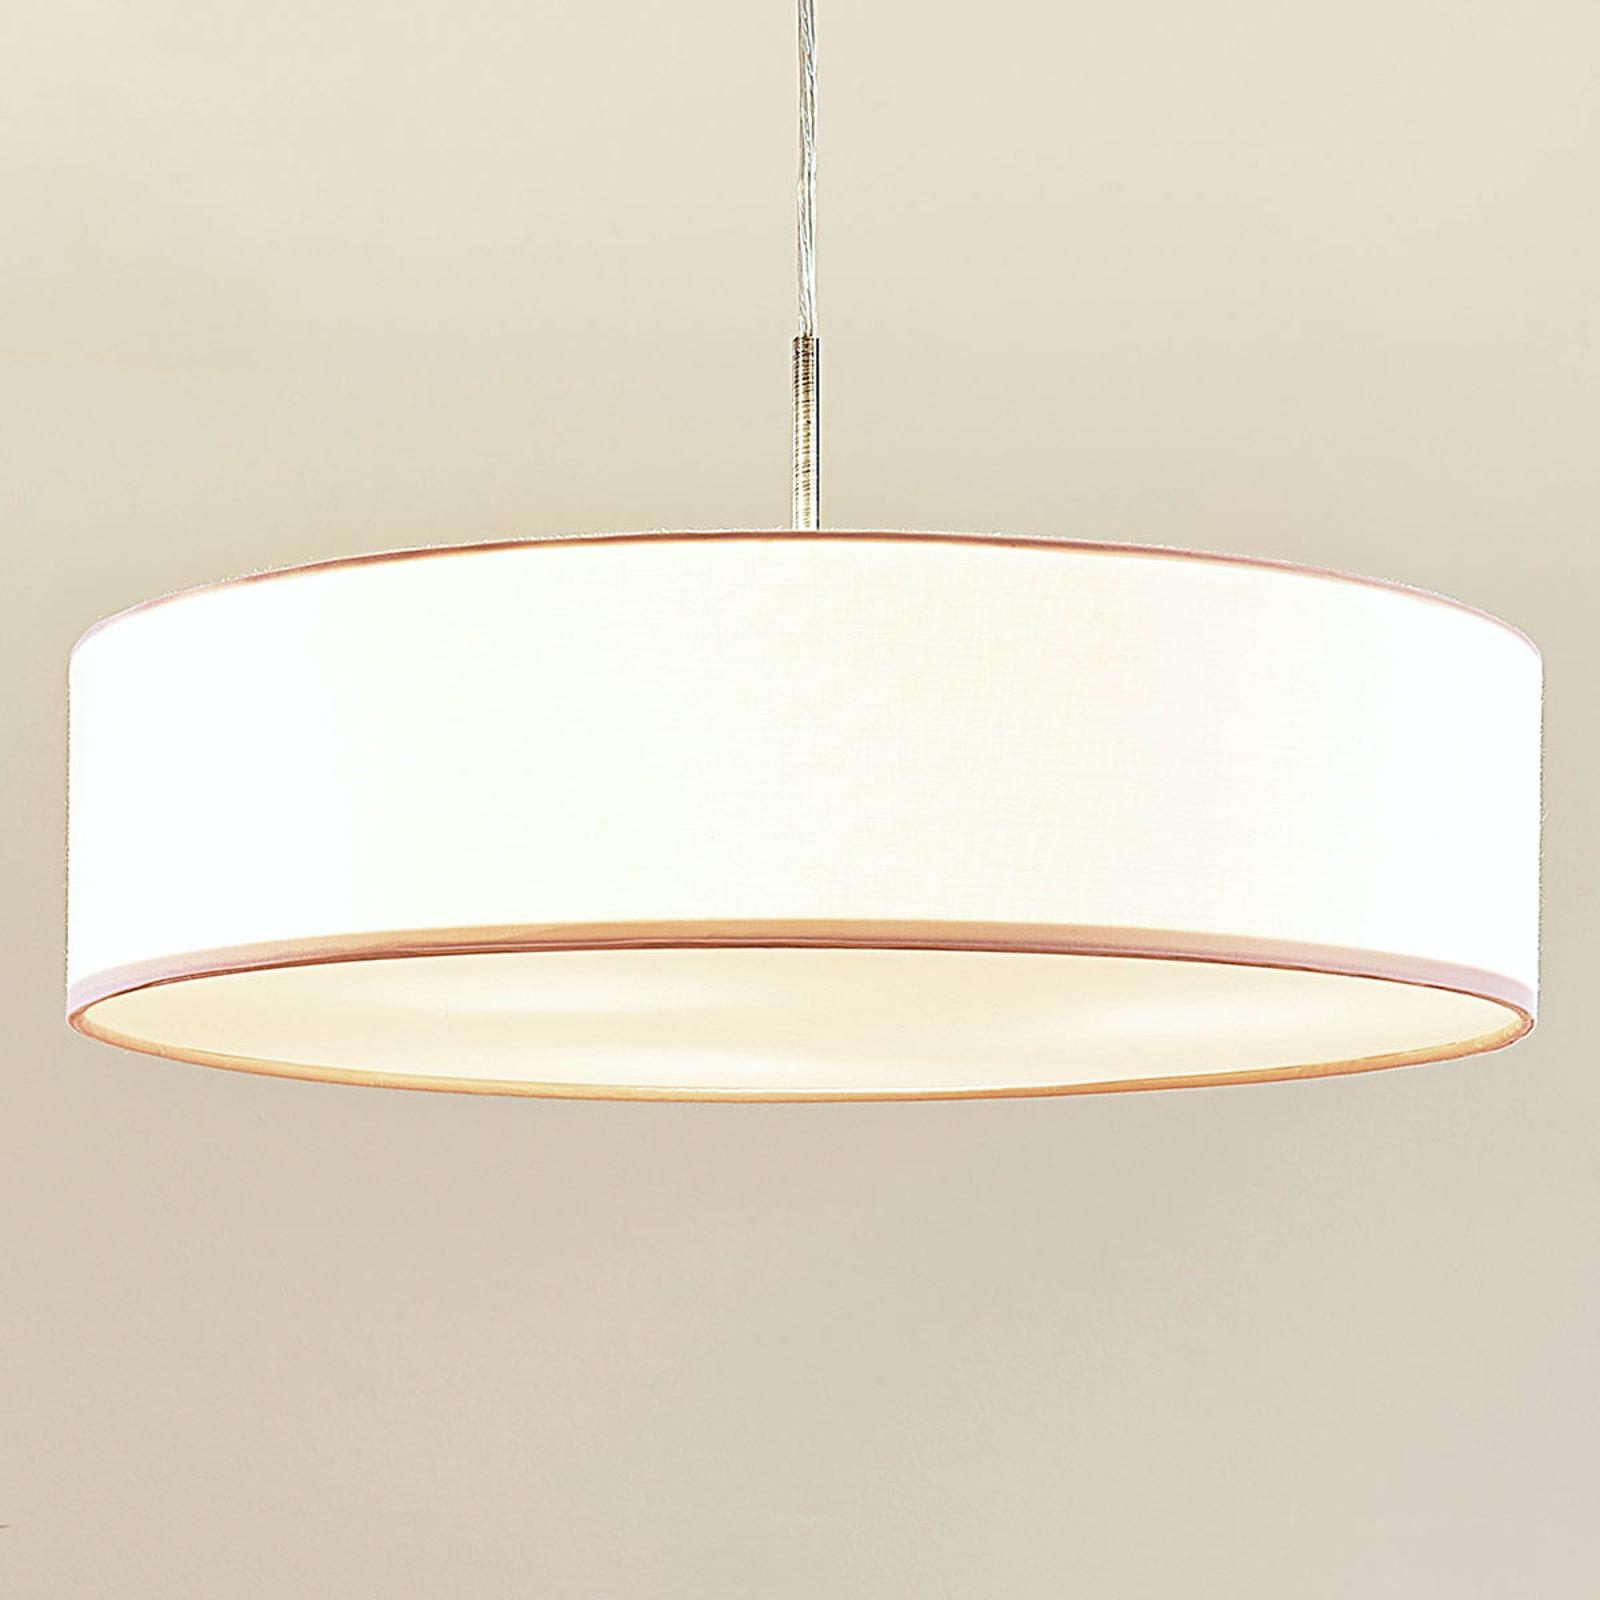 Witte LED-pendellamp Sebatin van stof